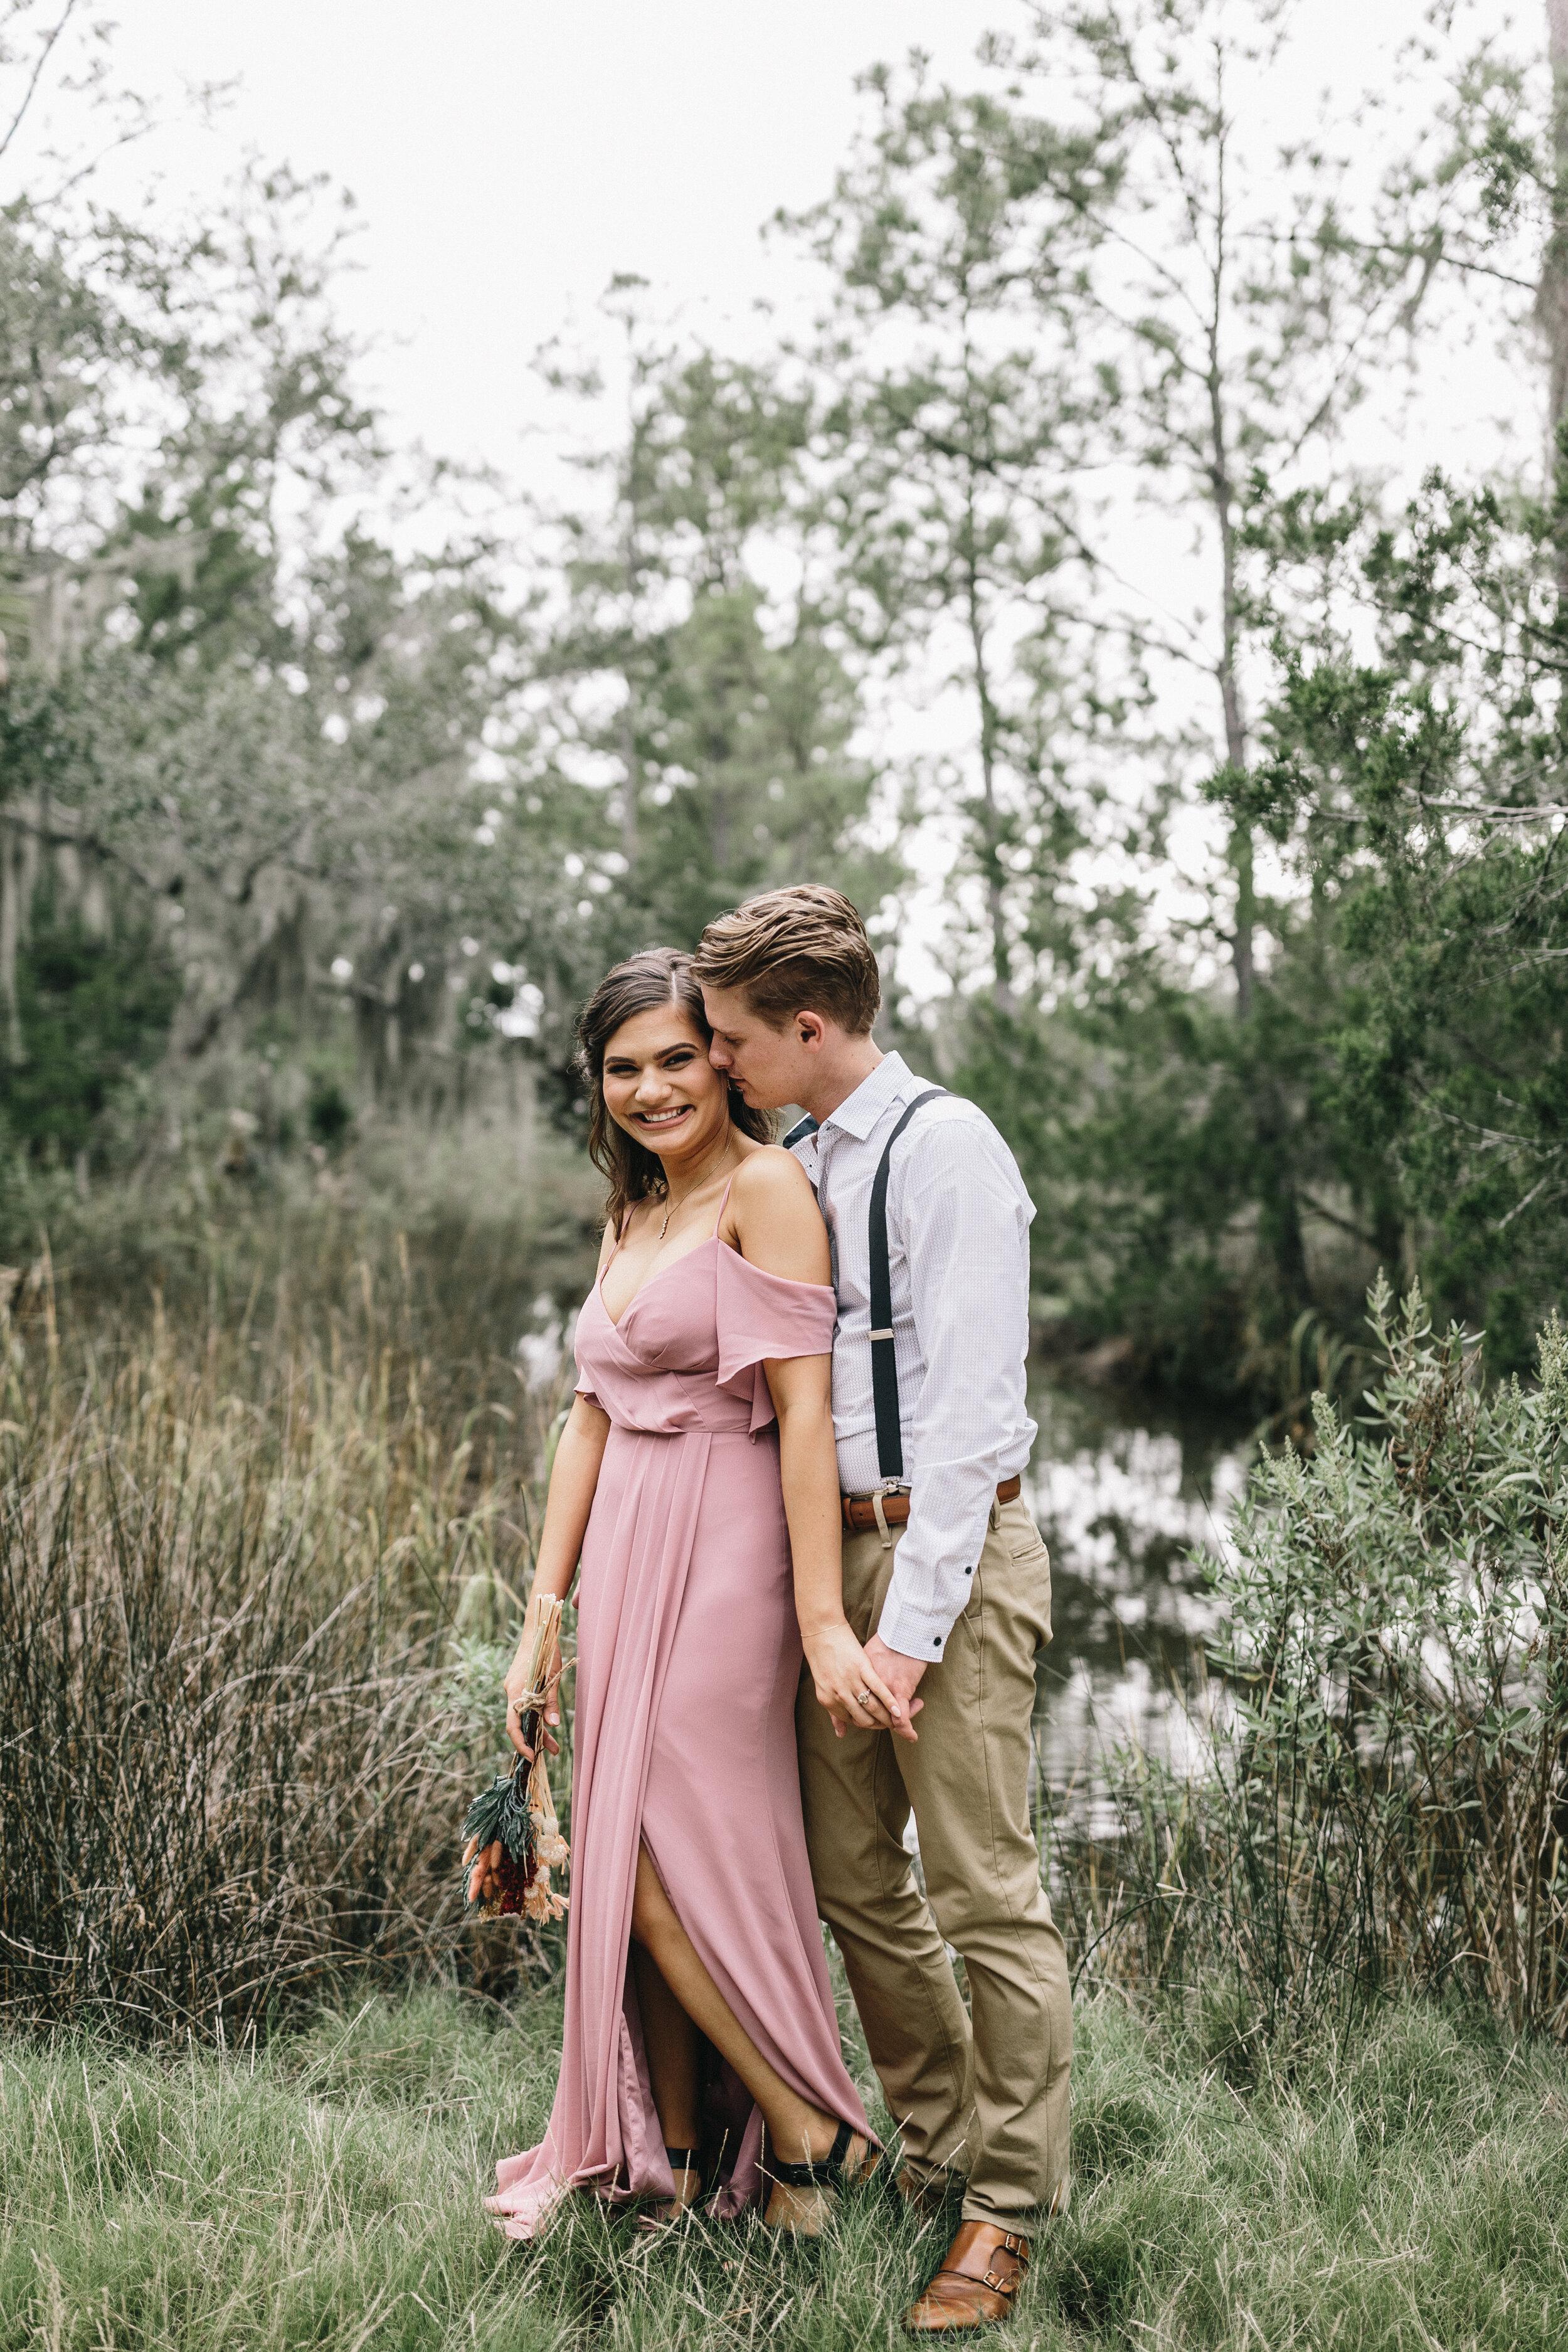 ivory-and-beau-couple-weddings-engagement-session-savannah-weddings-Mary+Cameron_engagementsession-7.jpg